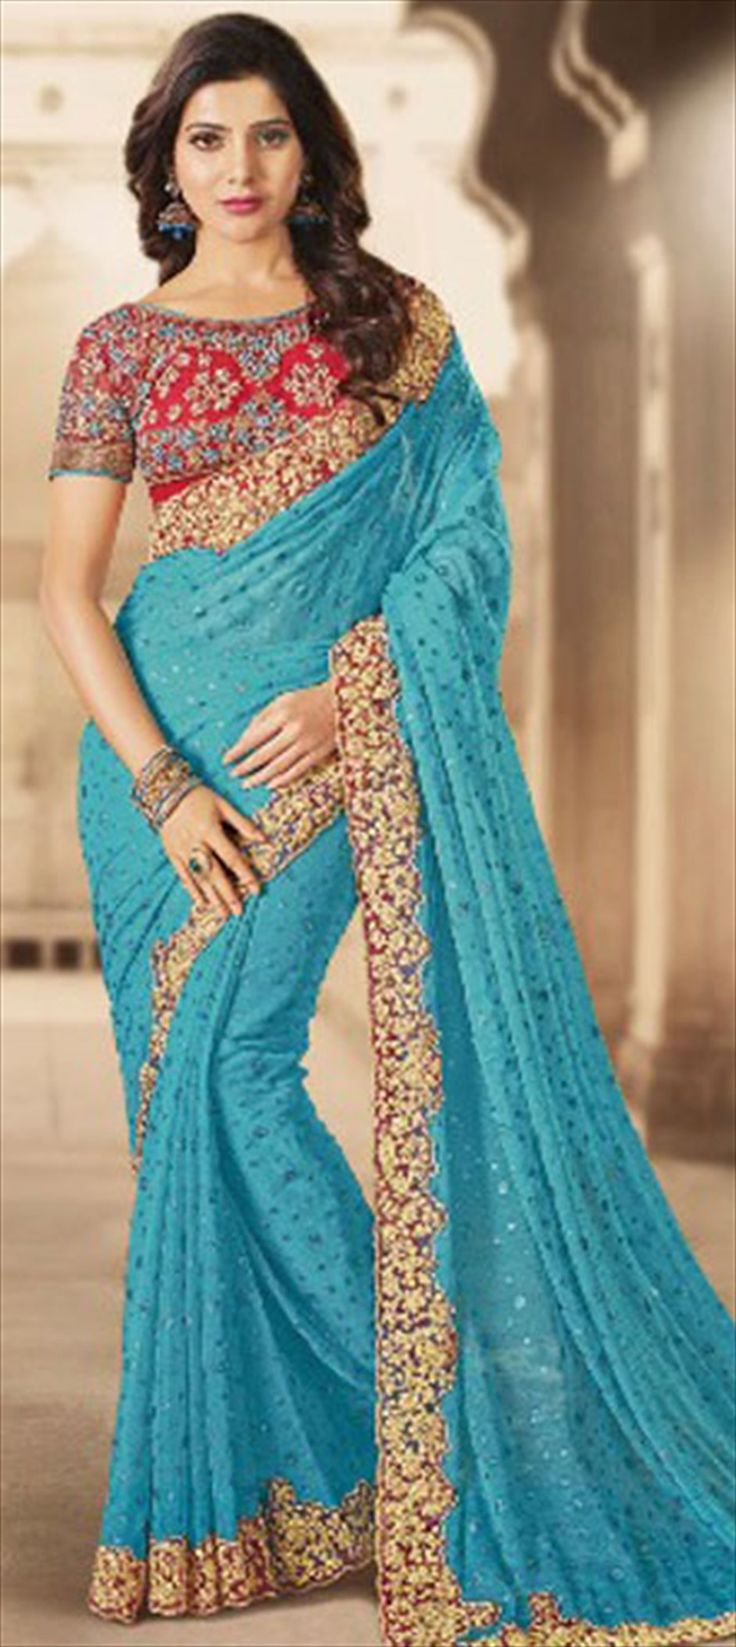 766 best Celebrities Fashion images on Pinterest   Indian wear ...